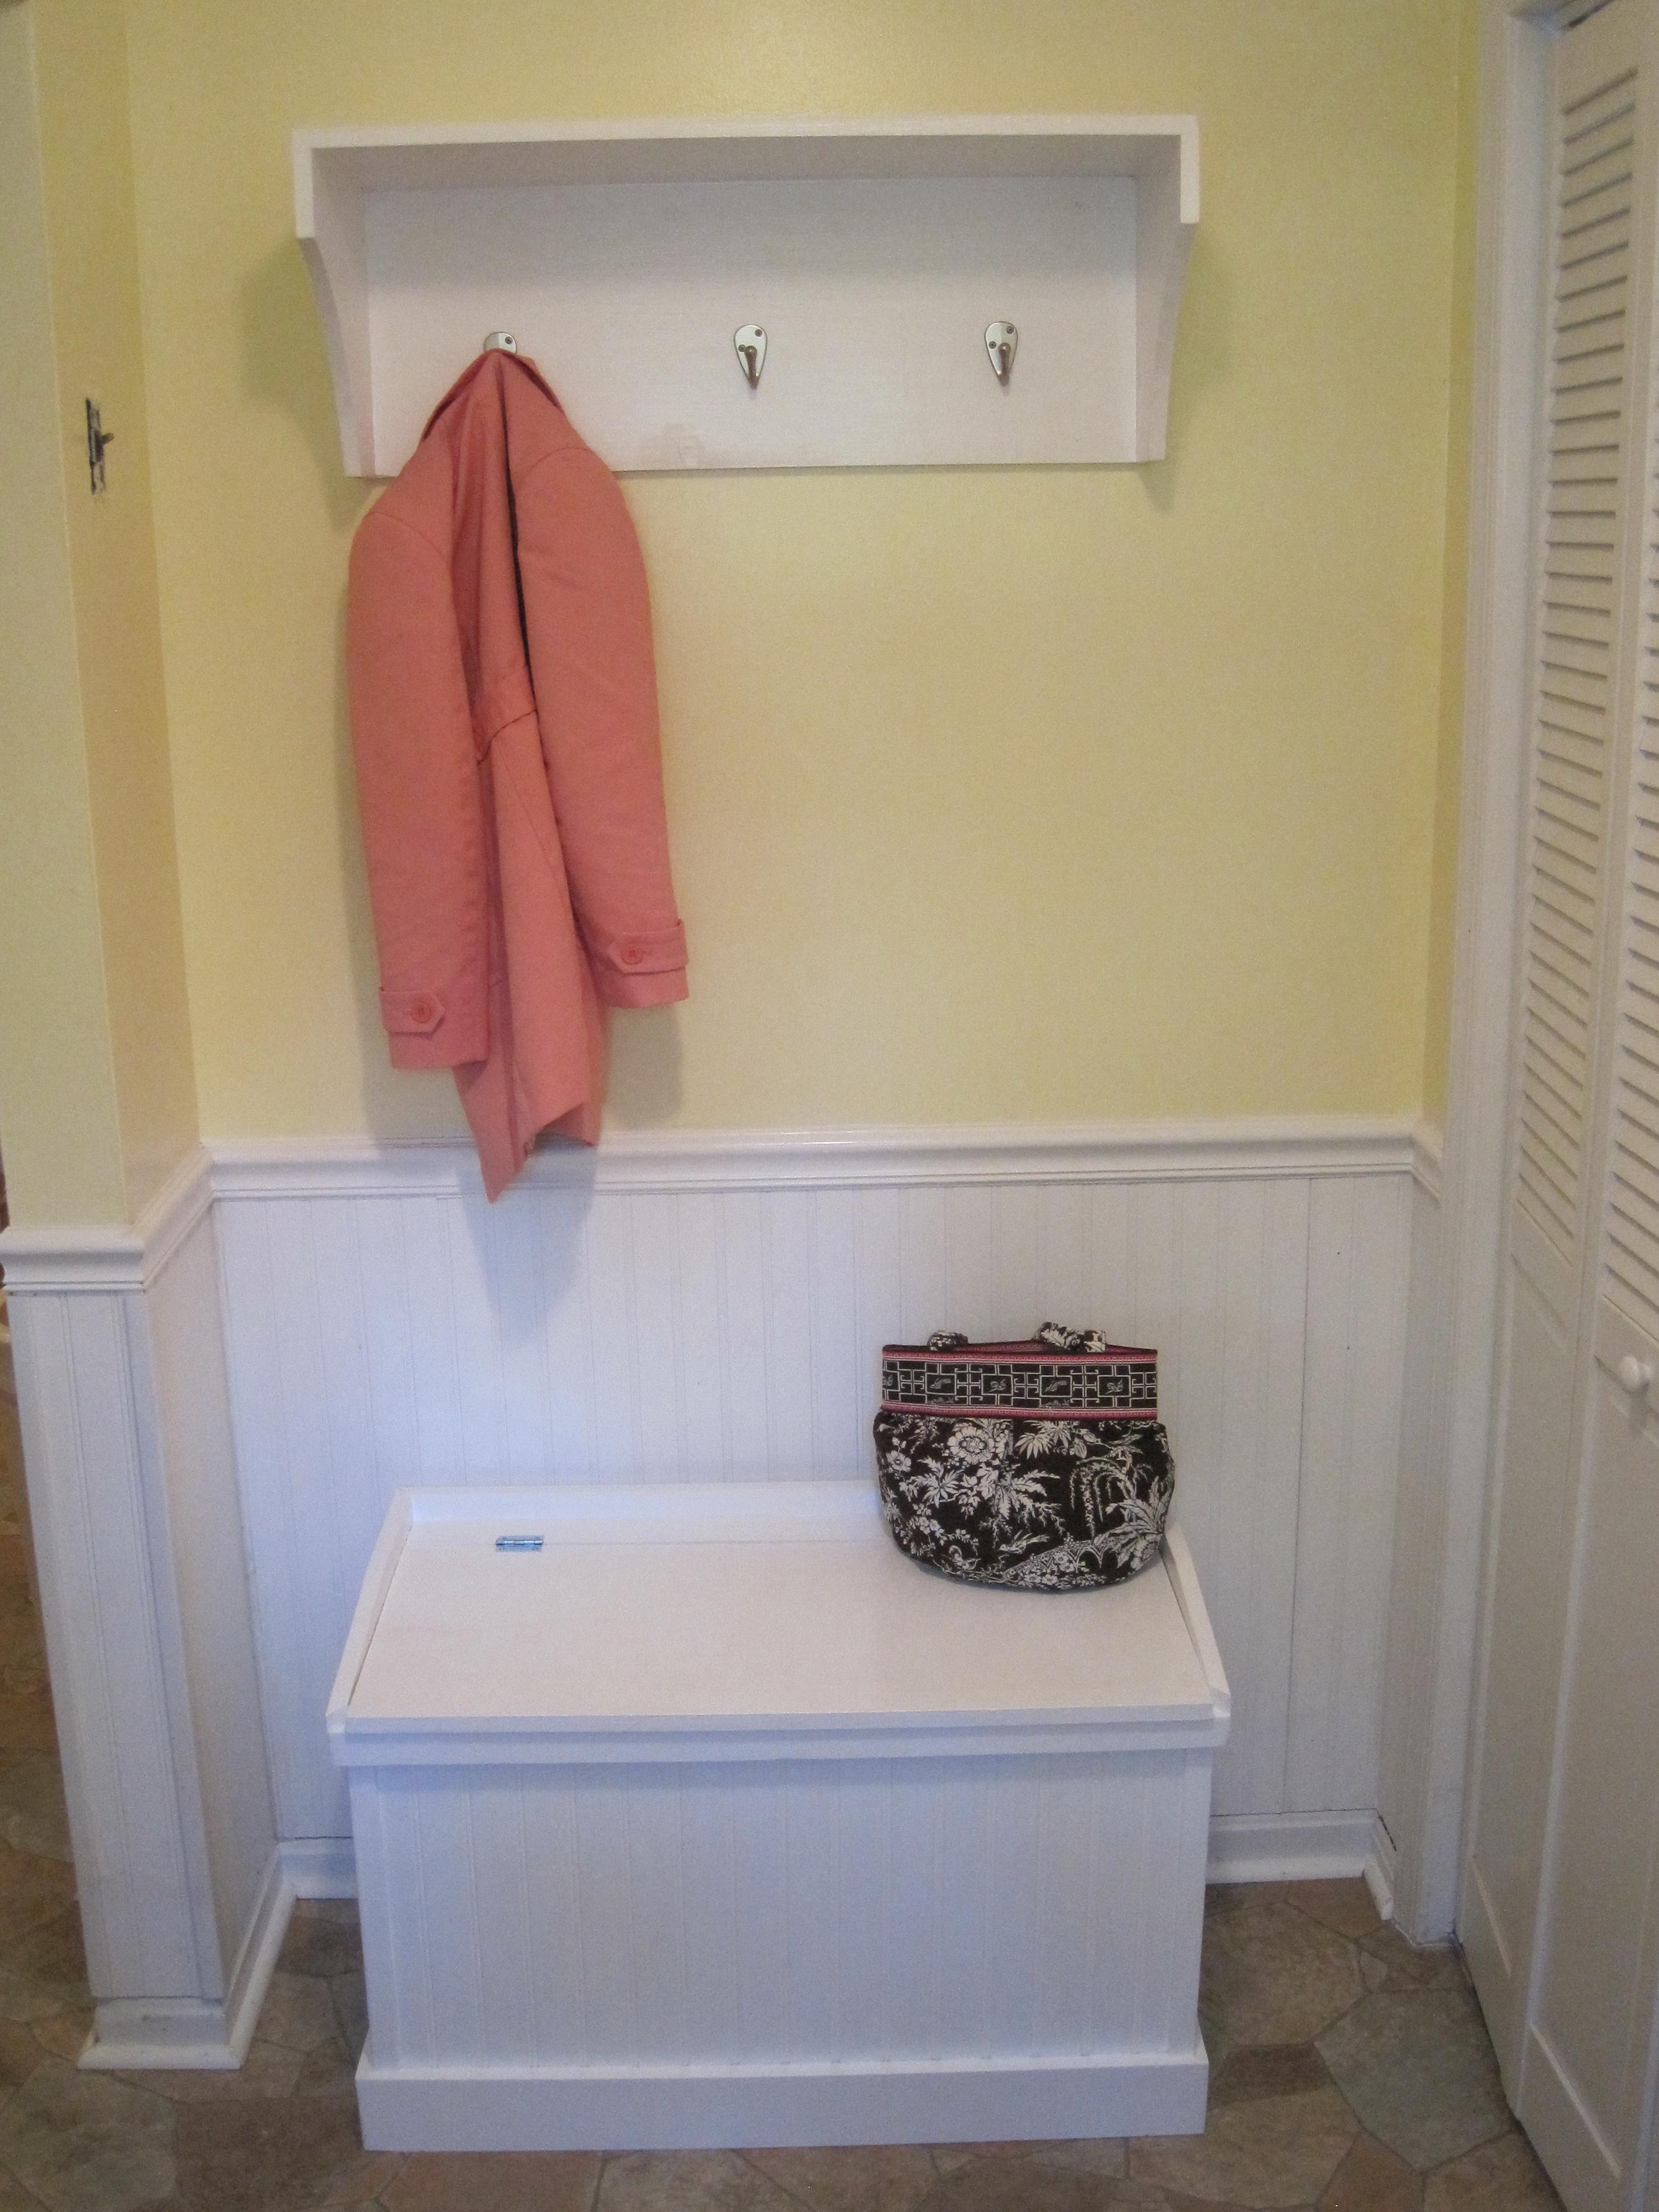 Bench Coat Rack Combo Home Design Ideas